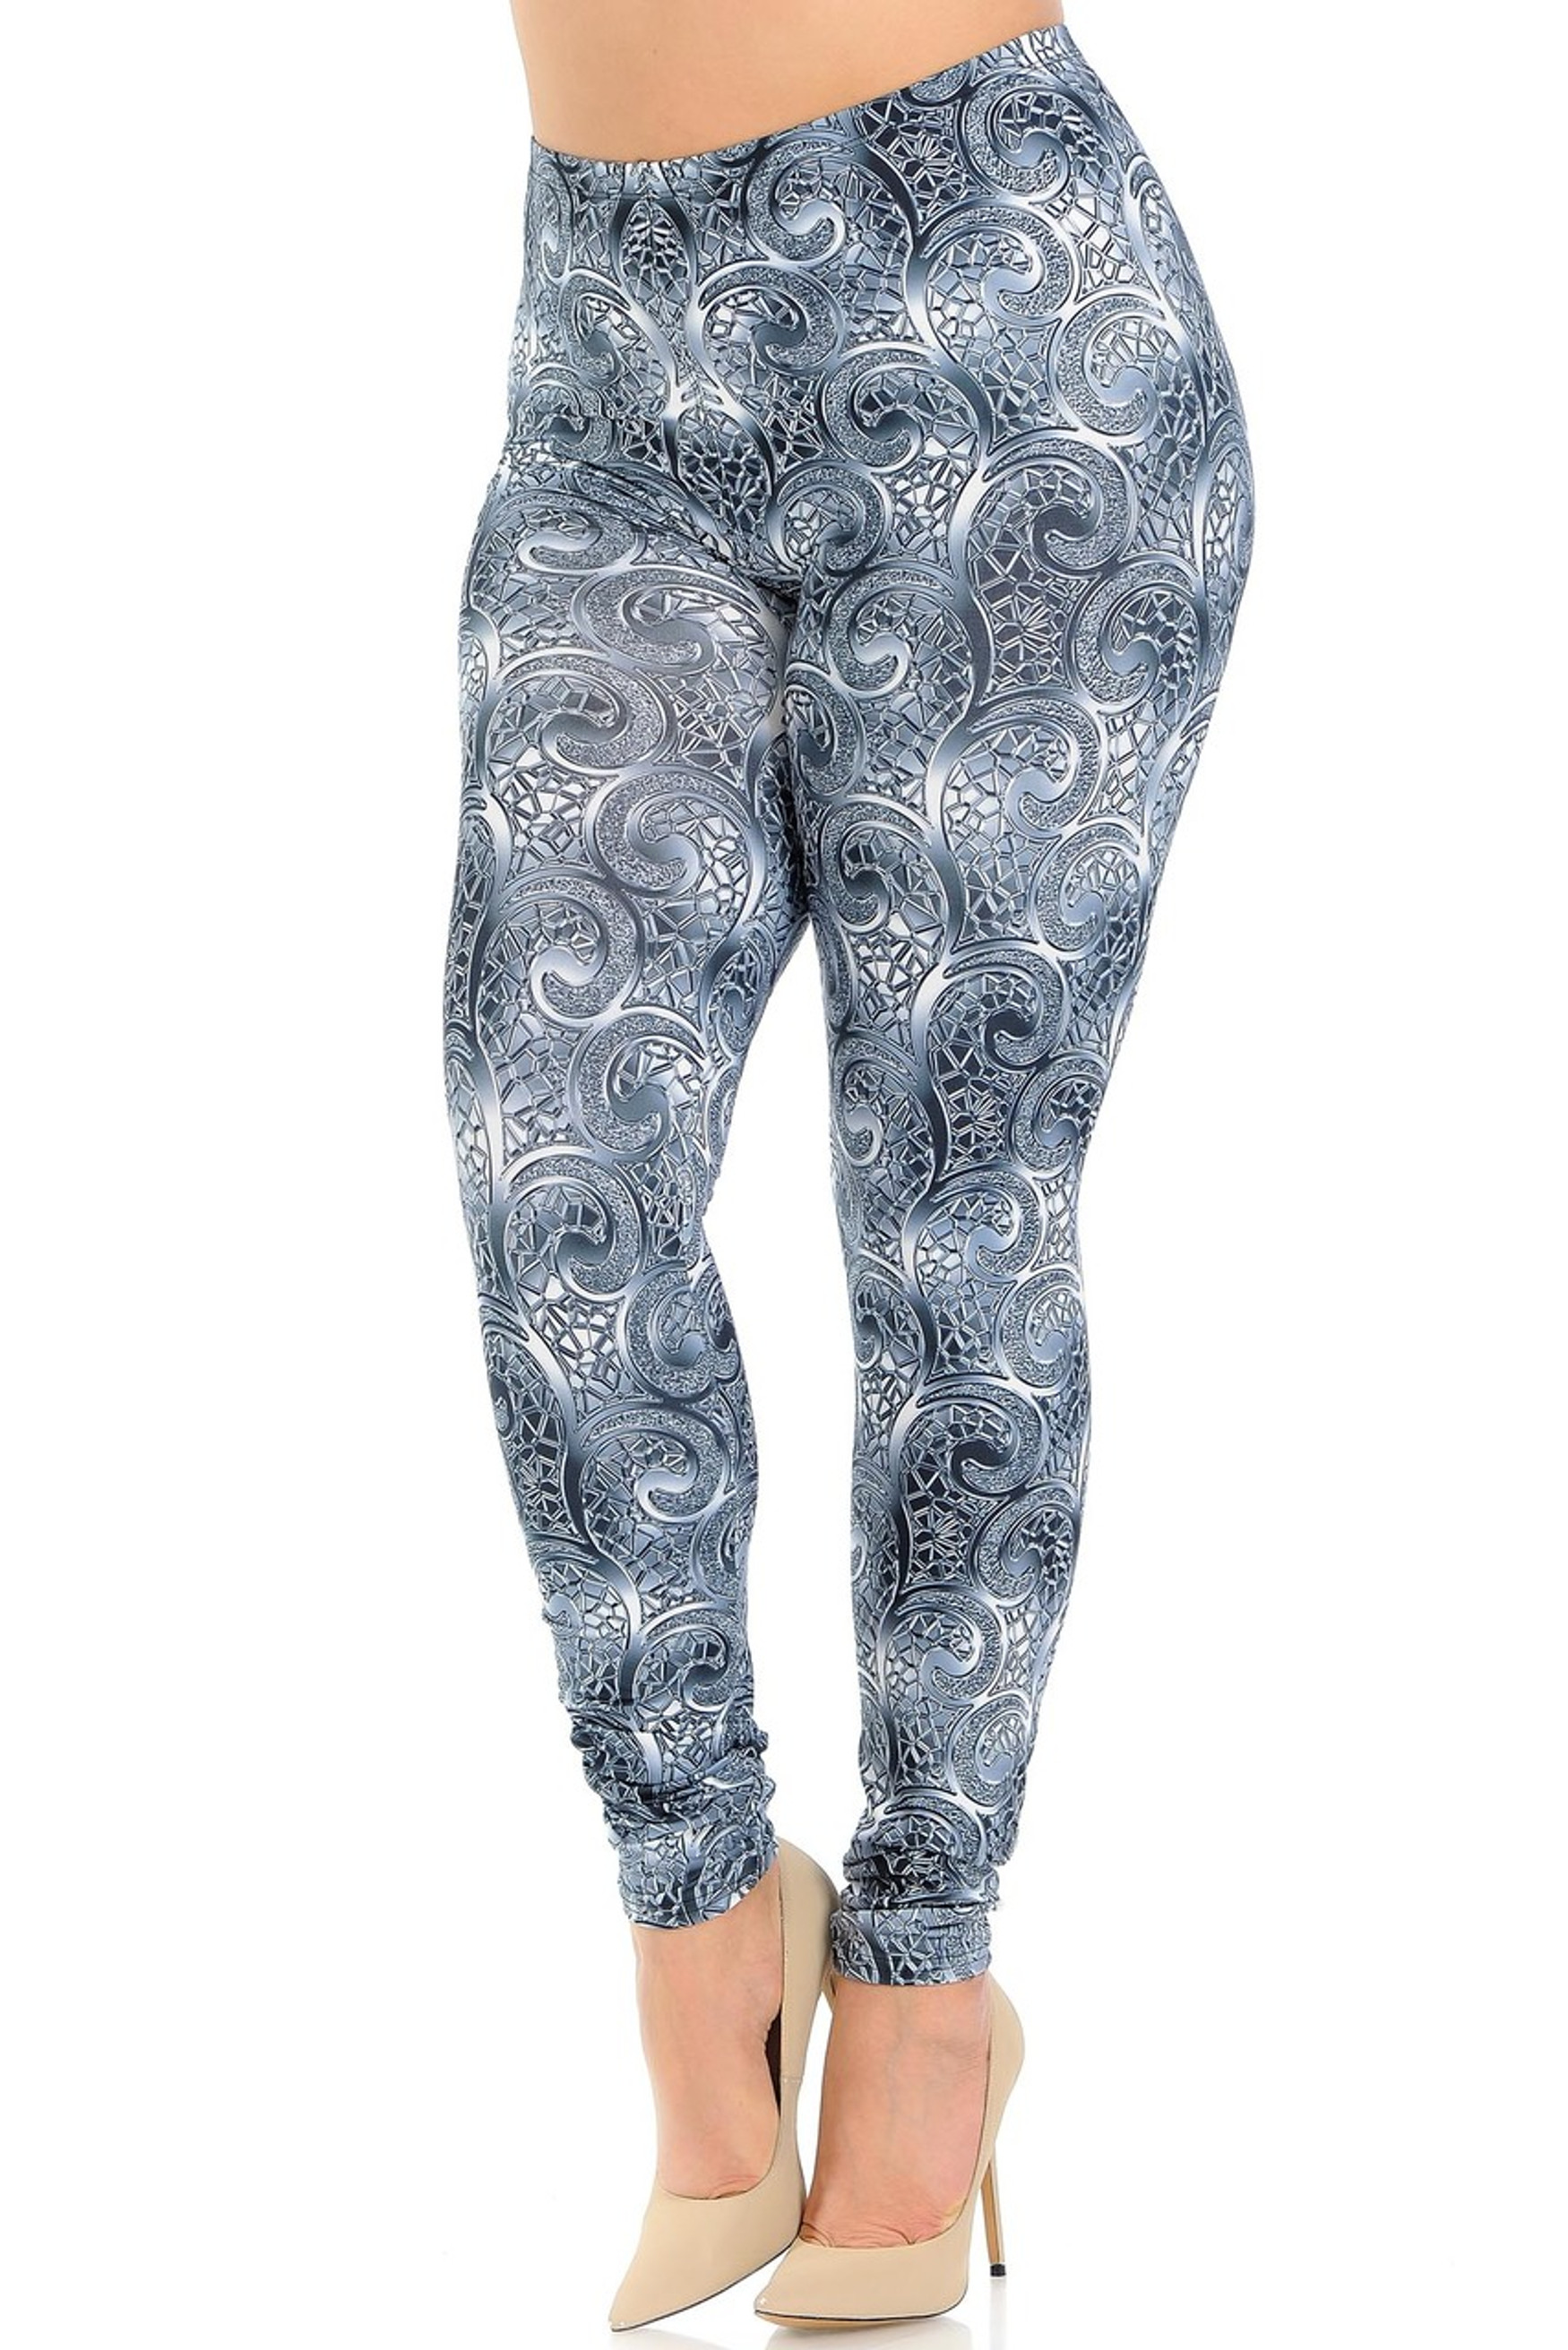 Creamy Soft Swirling Crystal Glass Plus Size Leggings - USA Fashion™